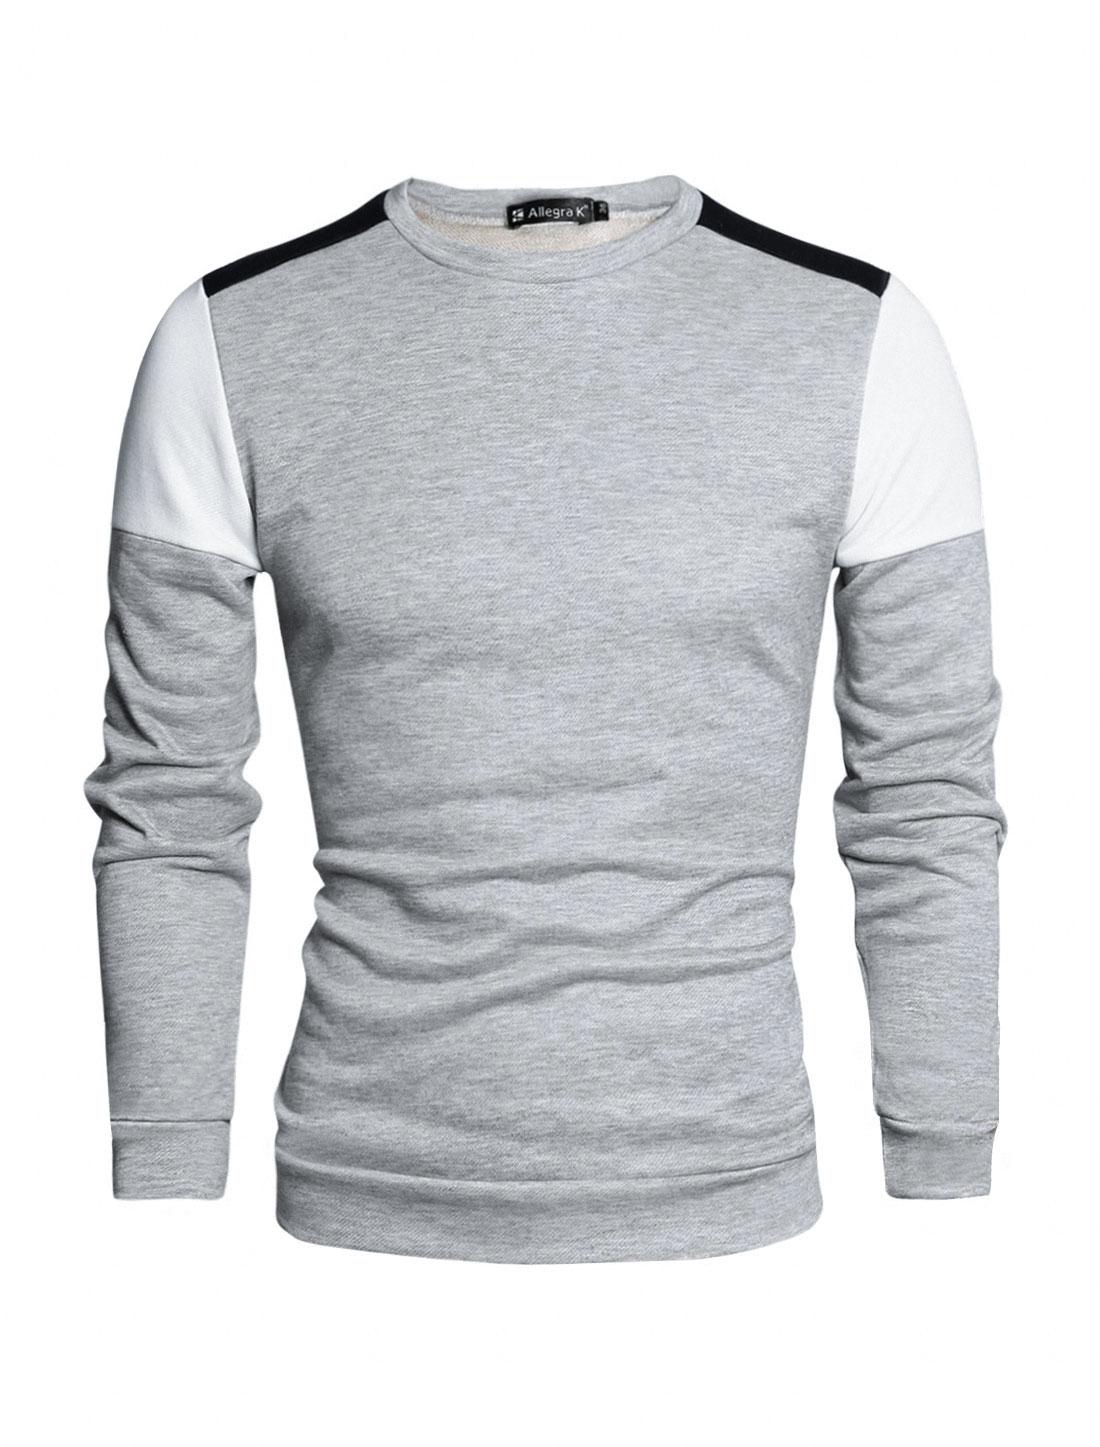 Men Color Block Crew Neck Long Sleeves Panel T-shirt Light Gray L